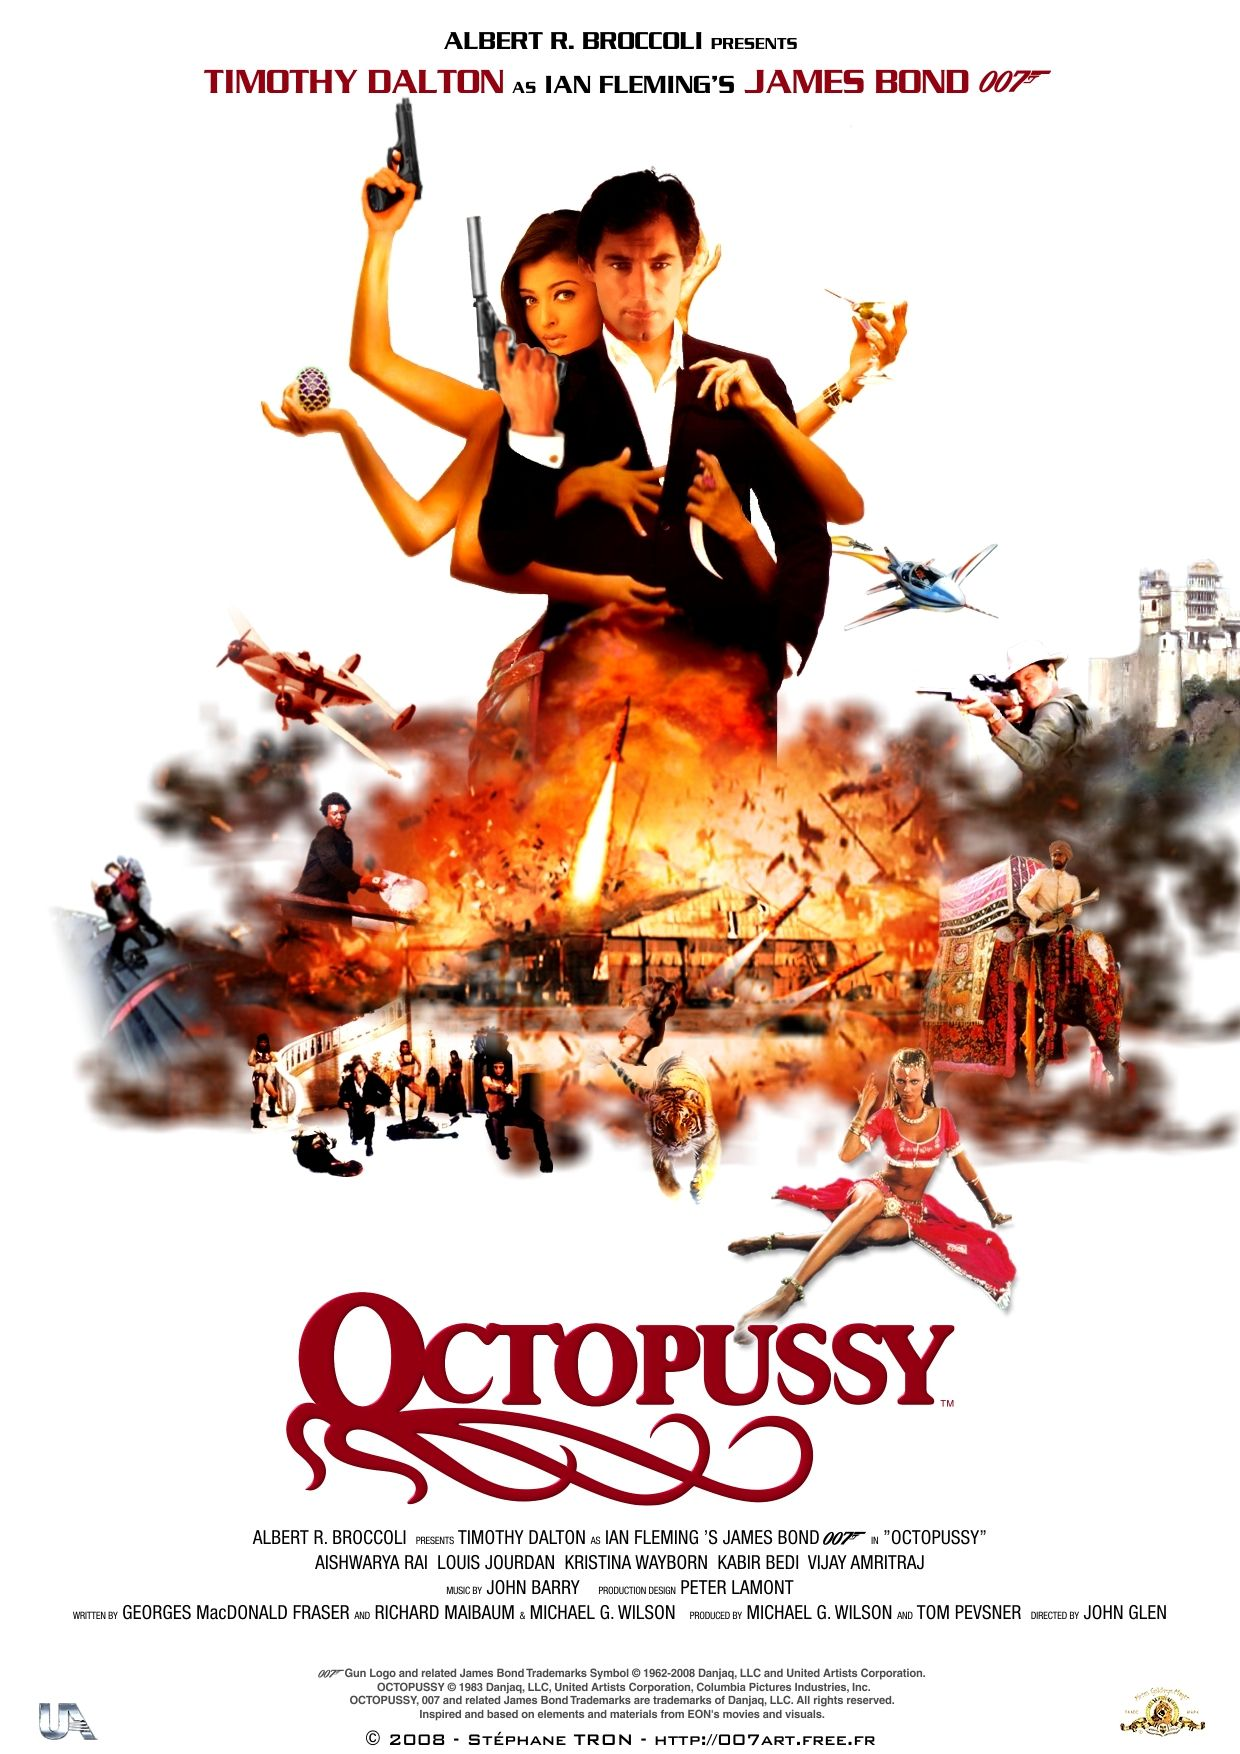 Octopussy Poster 1 James Bond 007 Dalton James